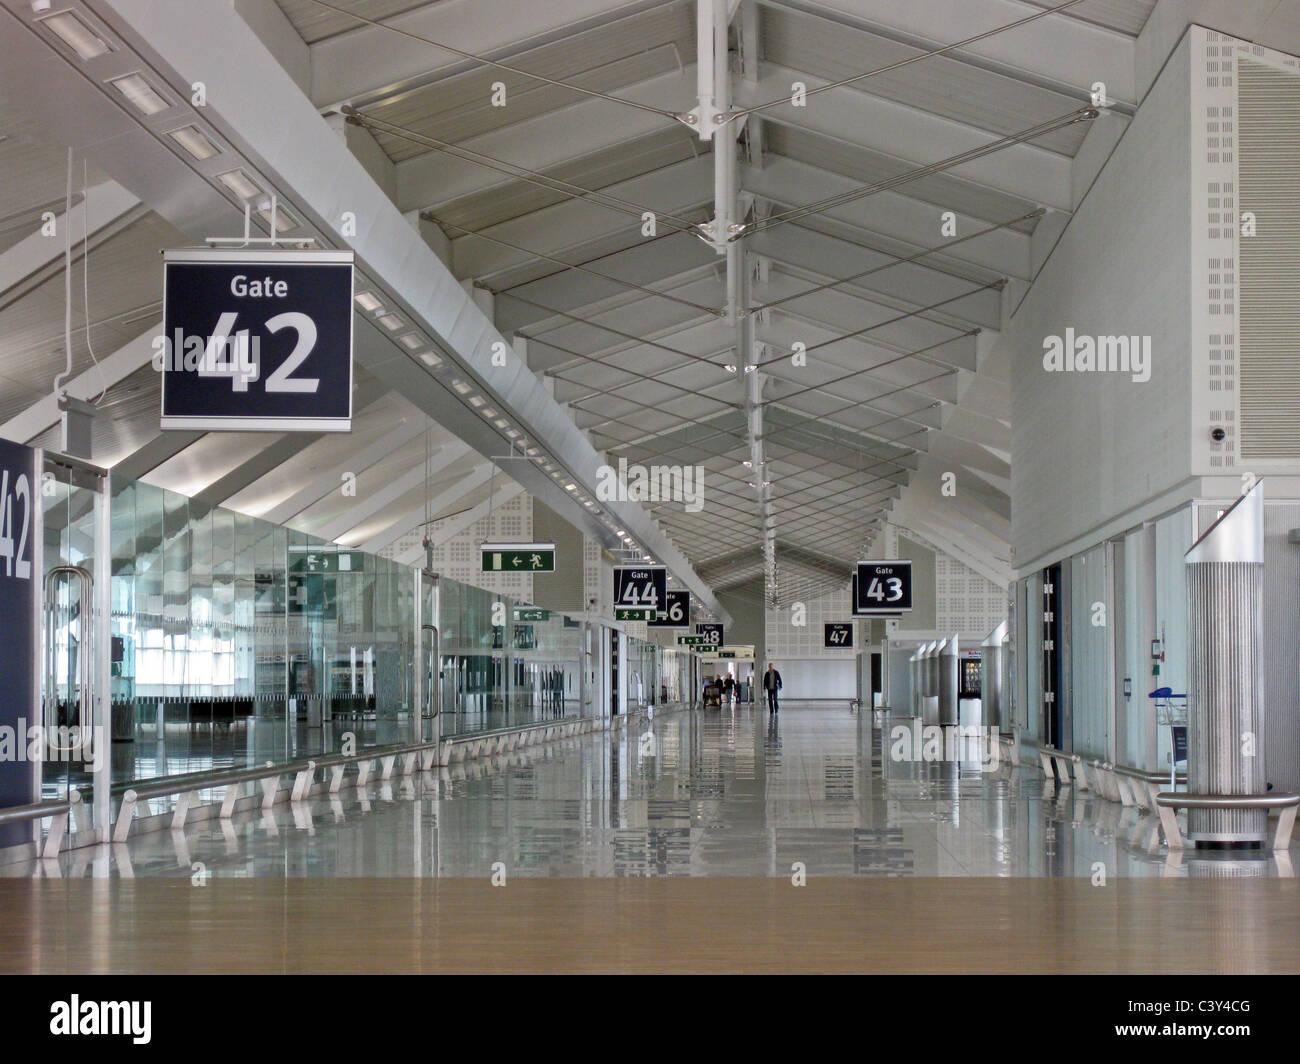 Gates Inside The International Pier Birmingham Airport Birmingham West Midlands Uk